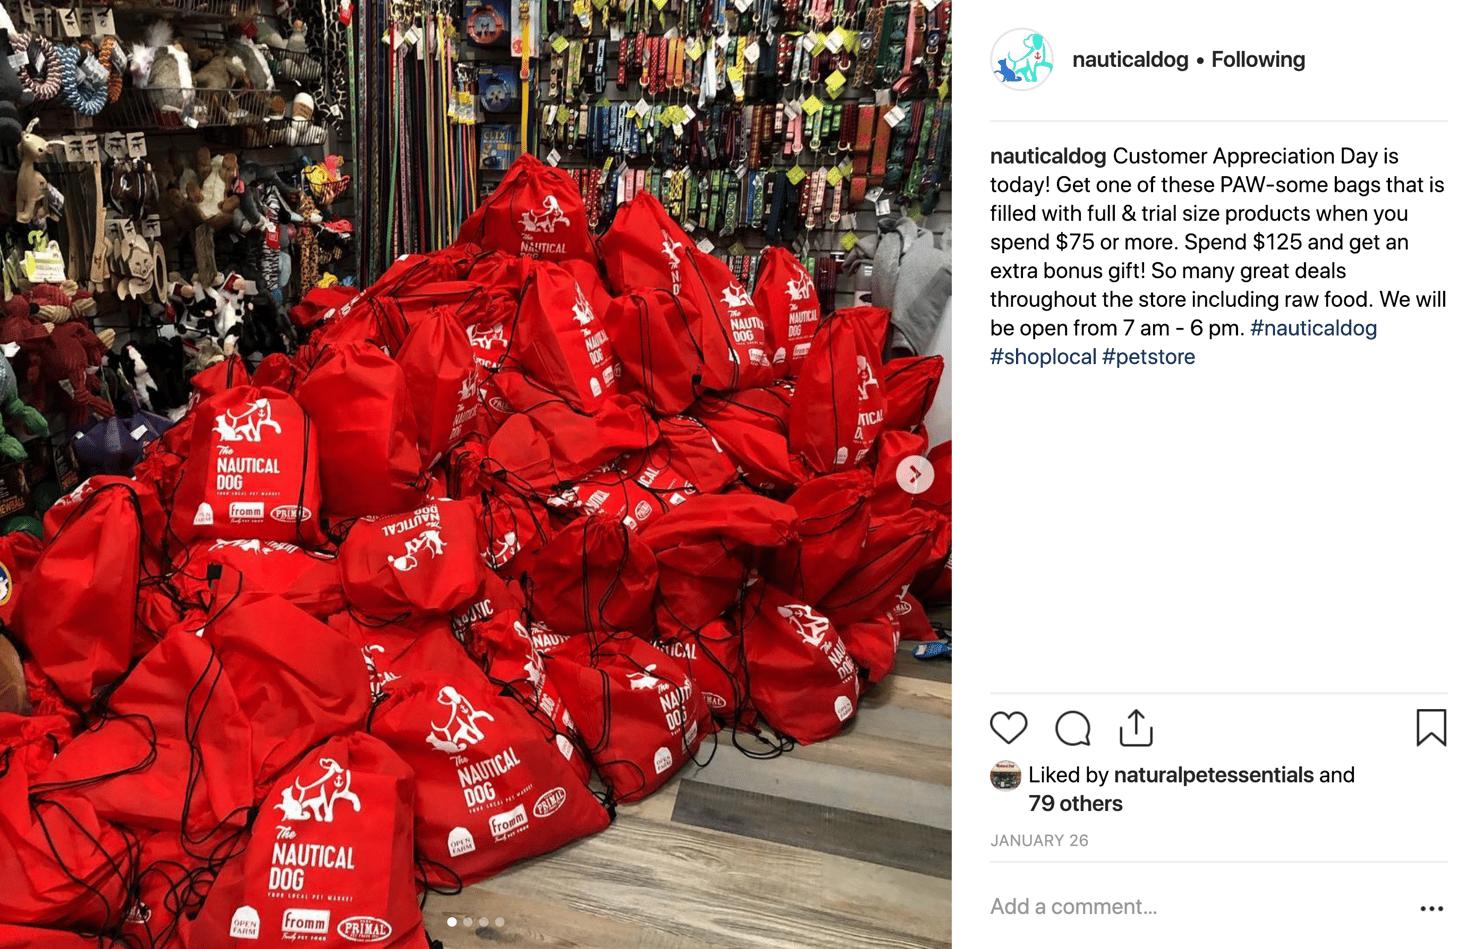 Nautical Dog - Goodie Bags